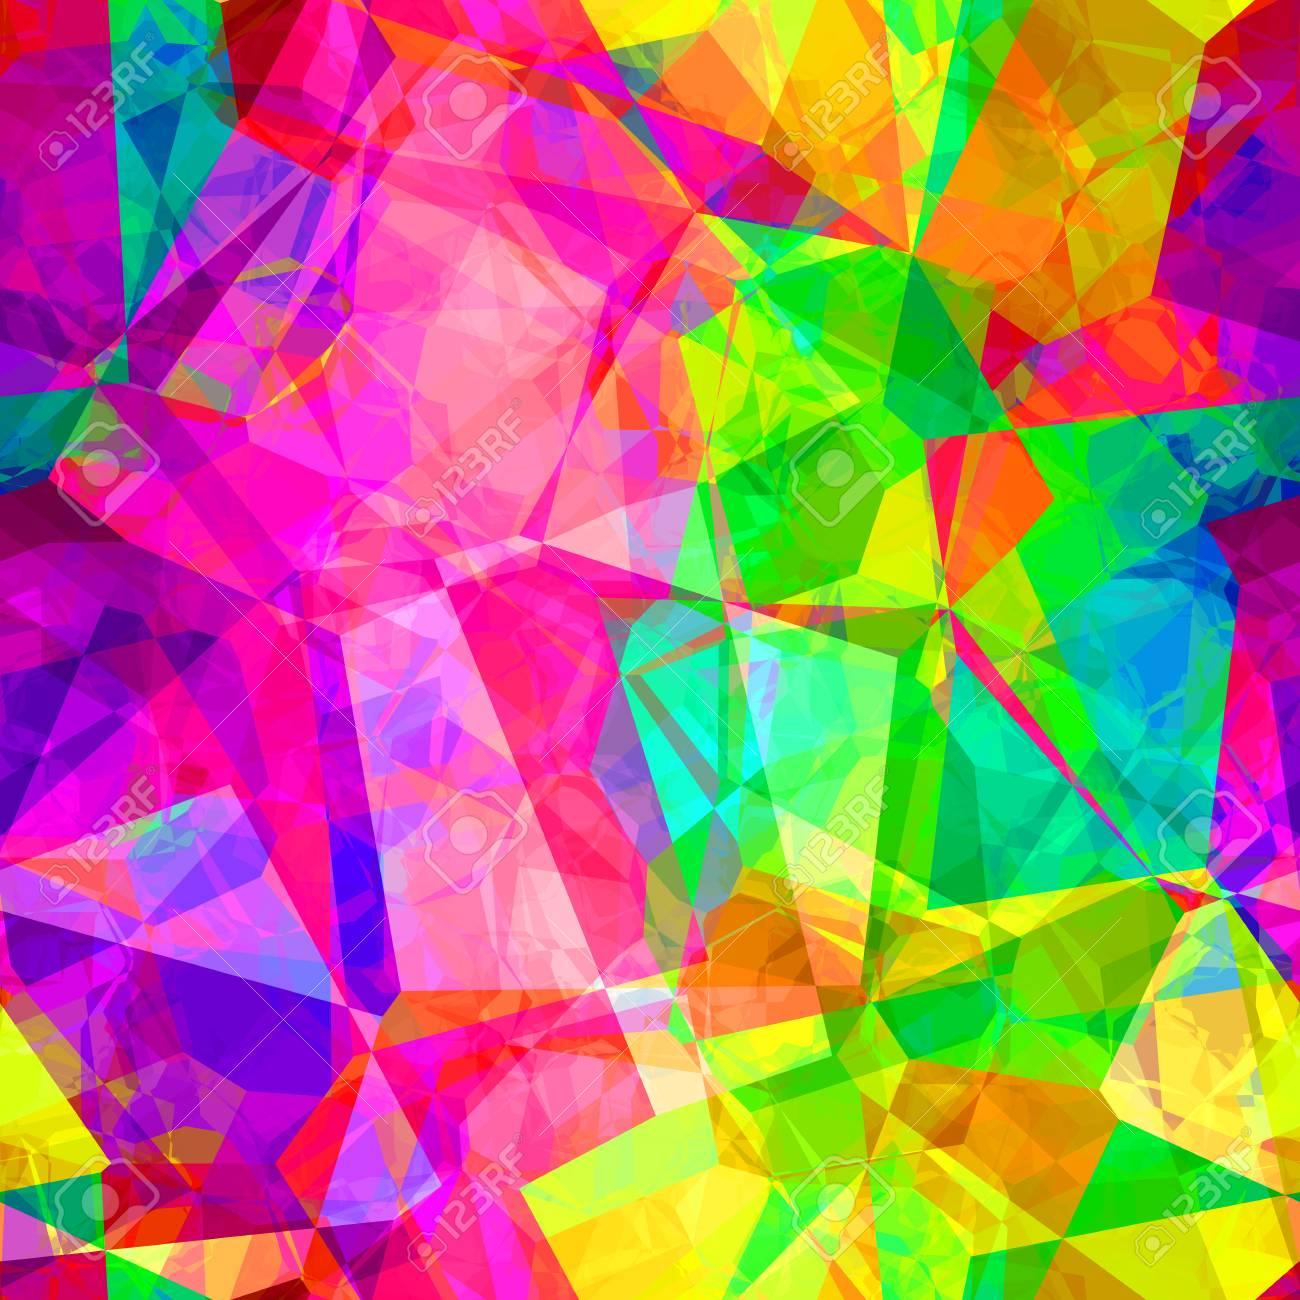 Polygon painting 58